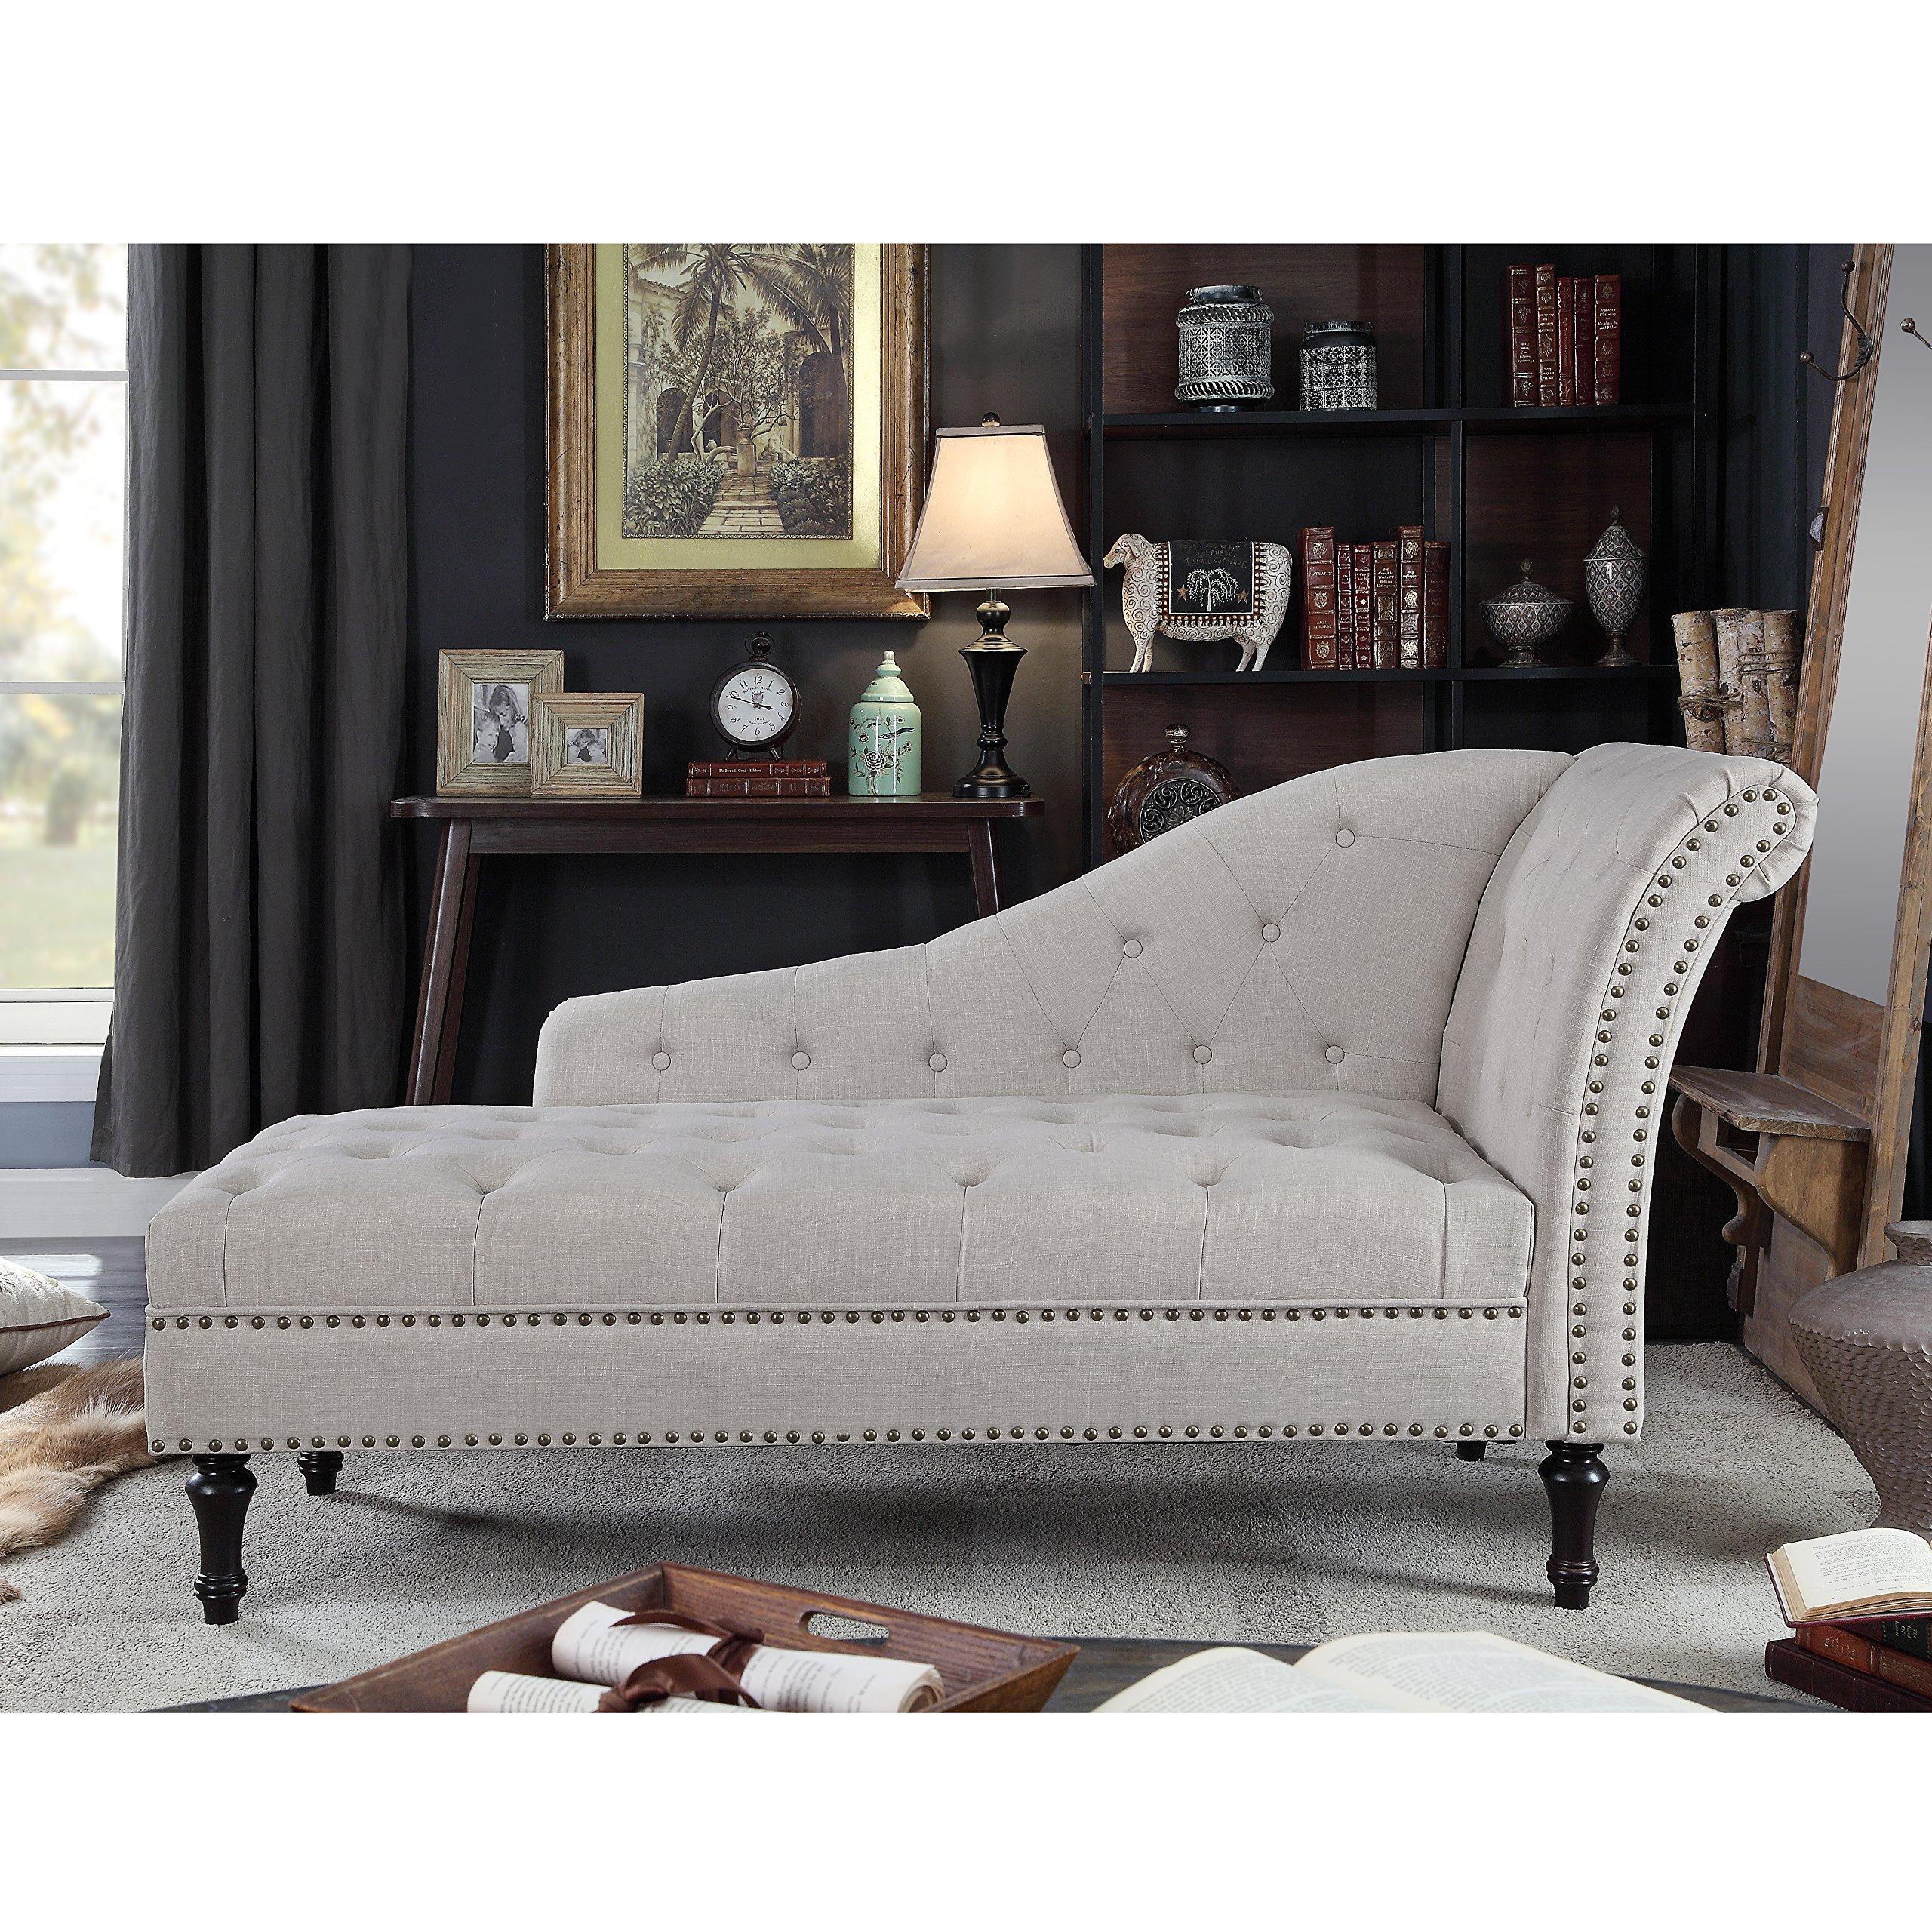 Rosevera Deedee Chaise Lounge, Beige by Rosevera